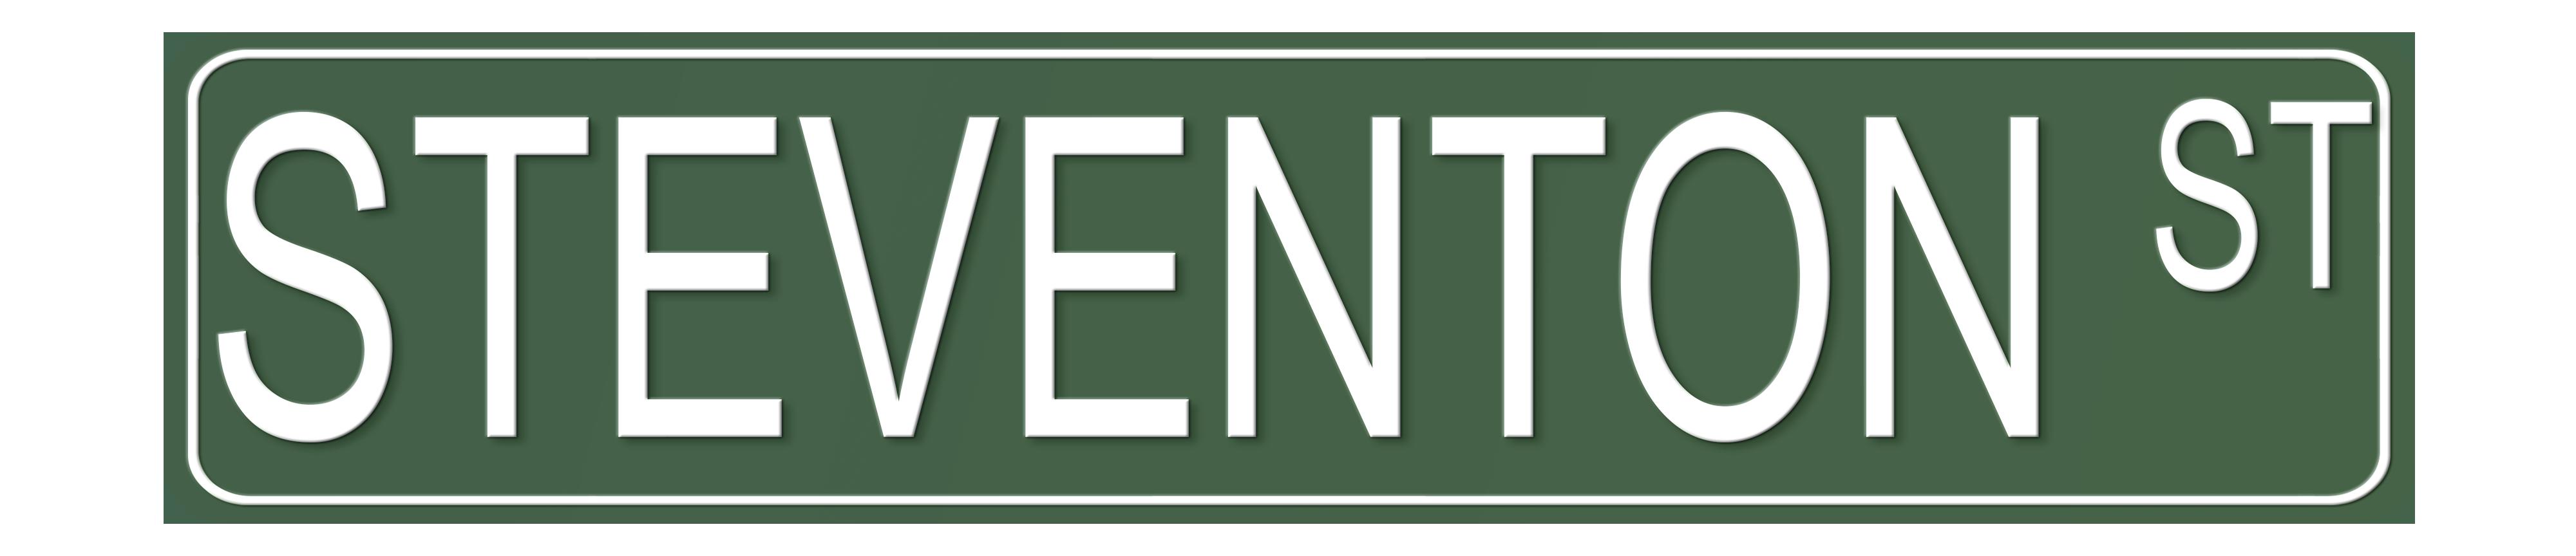 Steventon Street